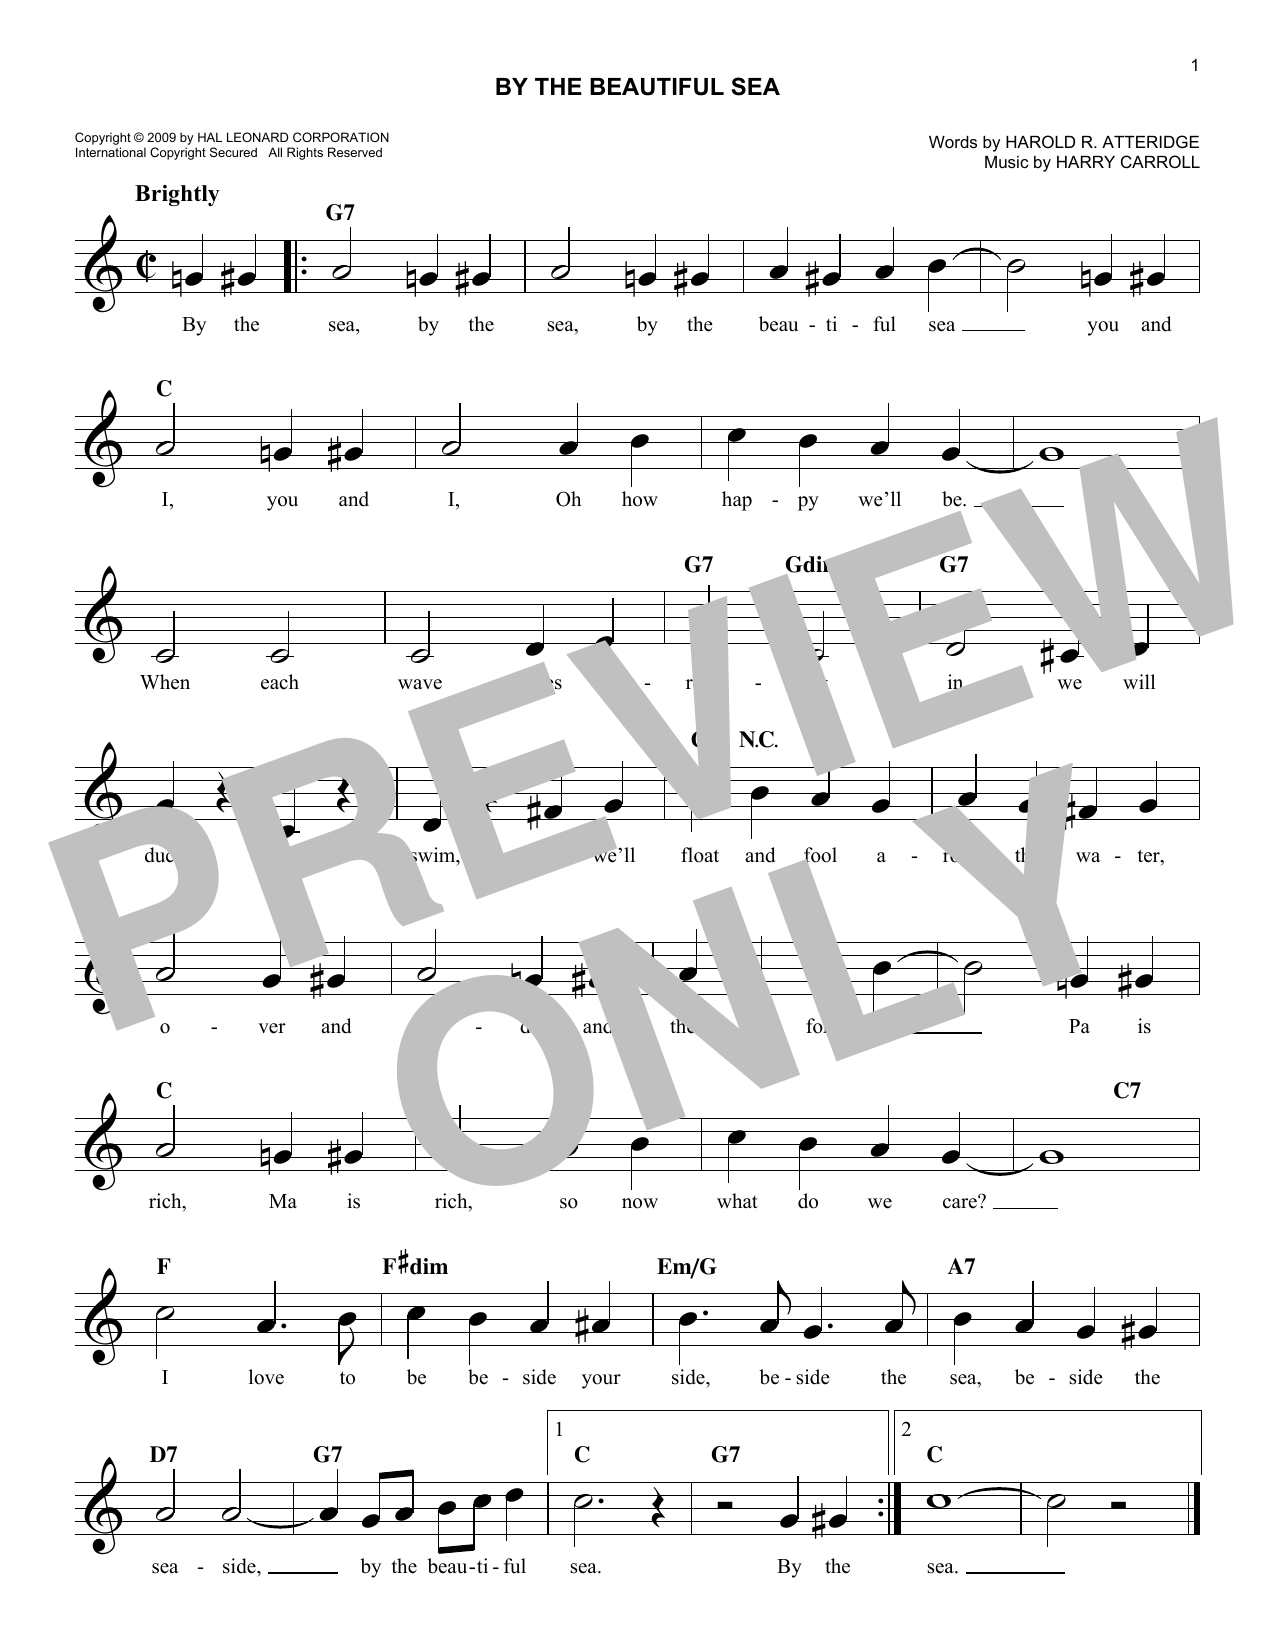 By The Beautiful Sea (Melody Line, Lyrics & Chords)